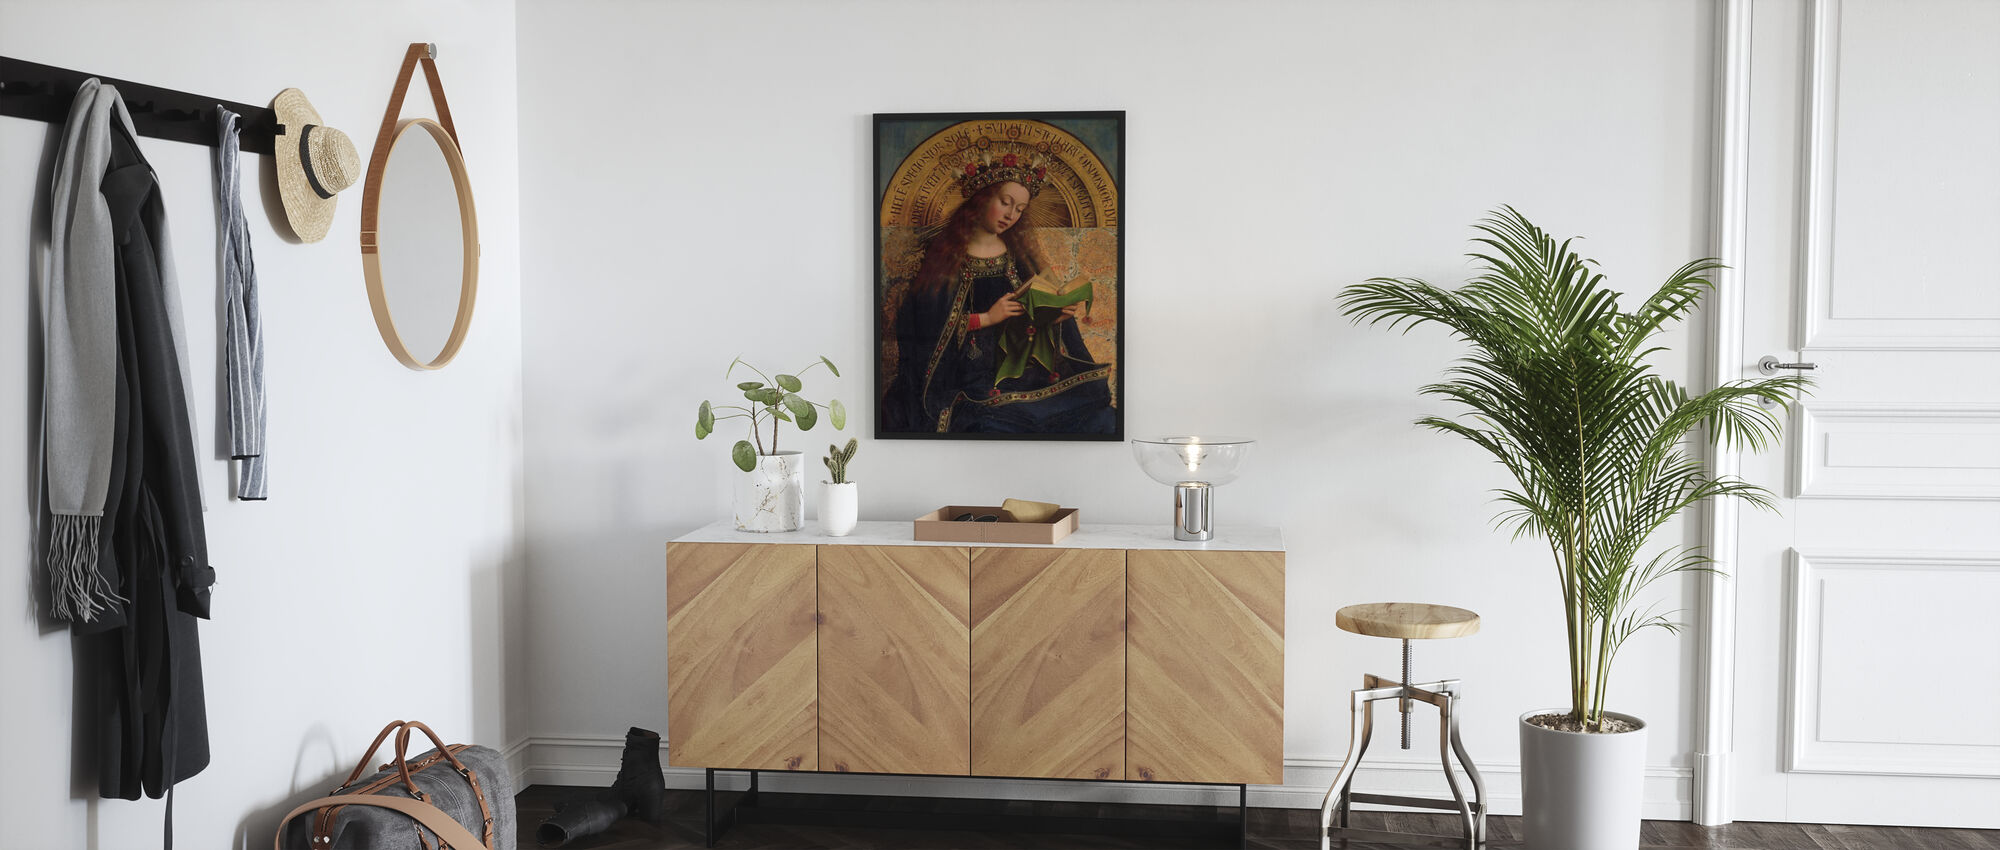 Vierge Marie - Hubert Eyck - Affiche - Entrée